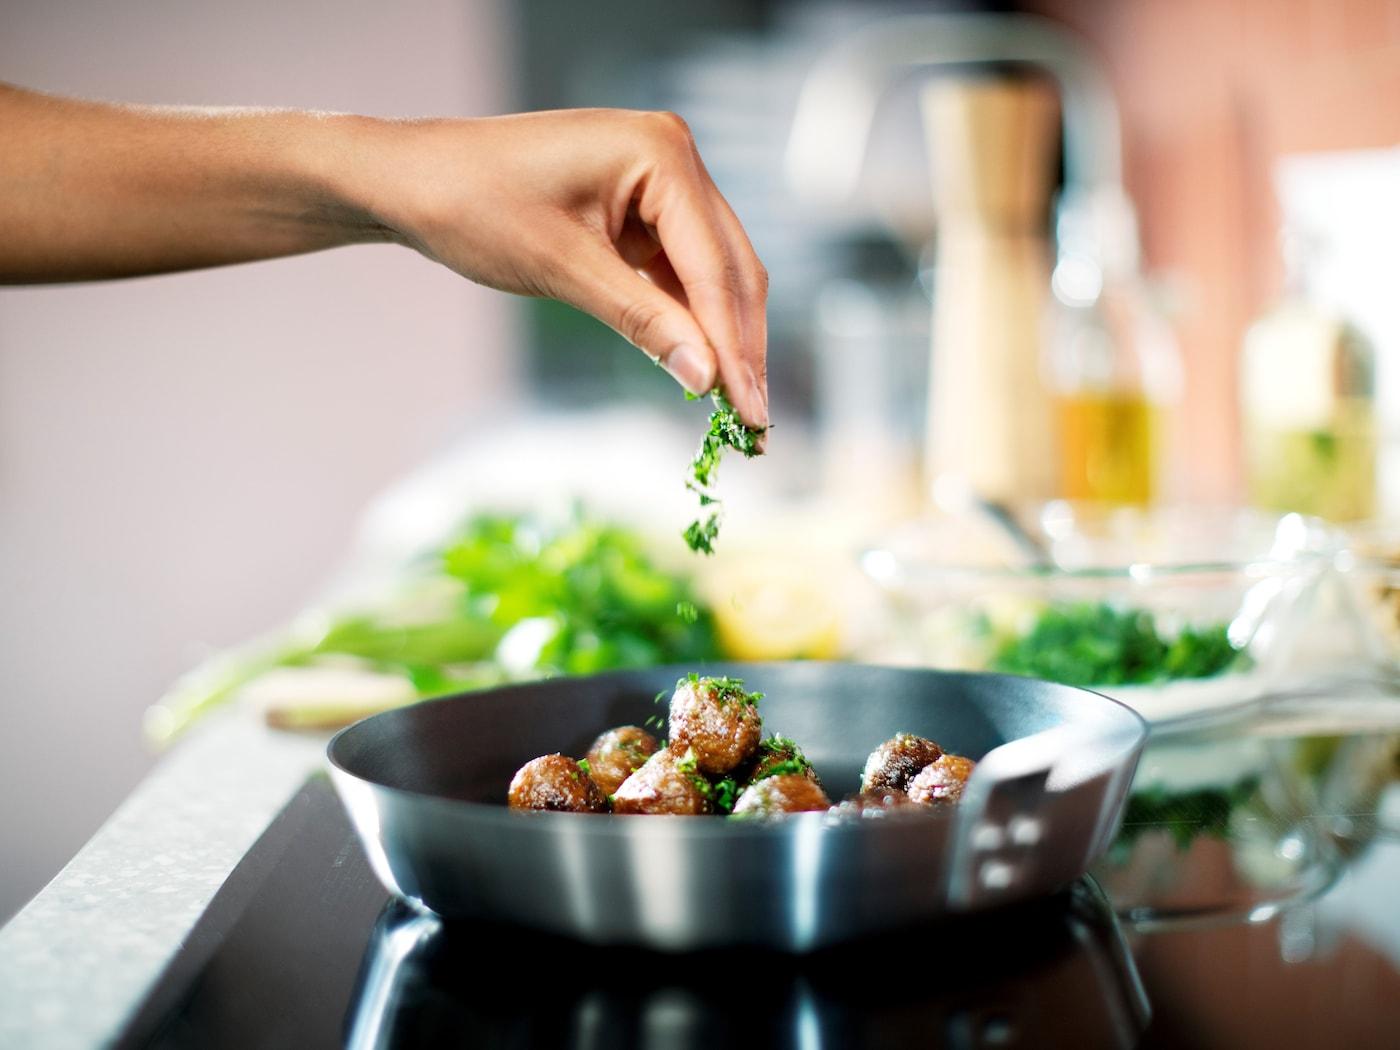 Ei hånd krydrer HUVUDROLL plantebaserte boller i ei IKEA 365+ stekepanne.